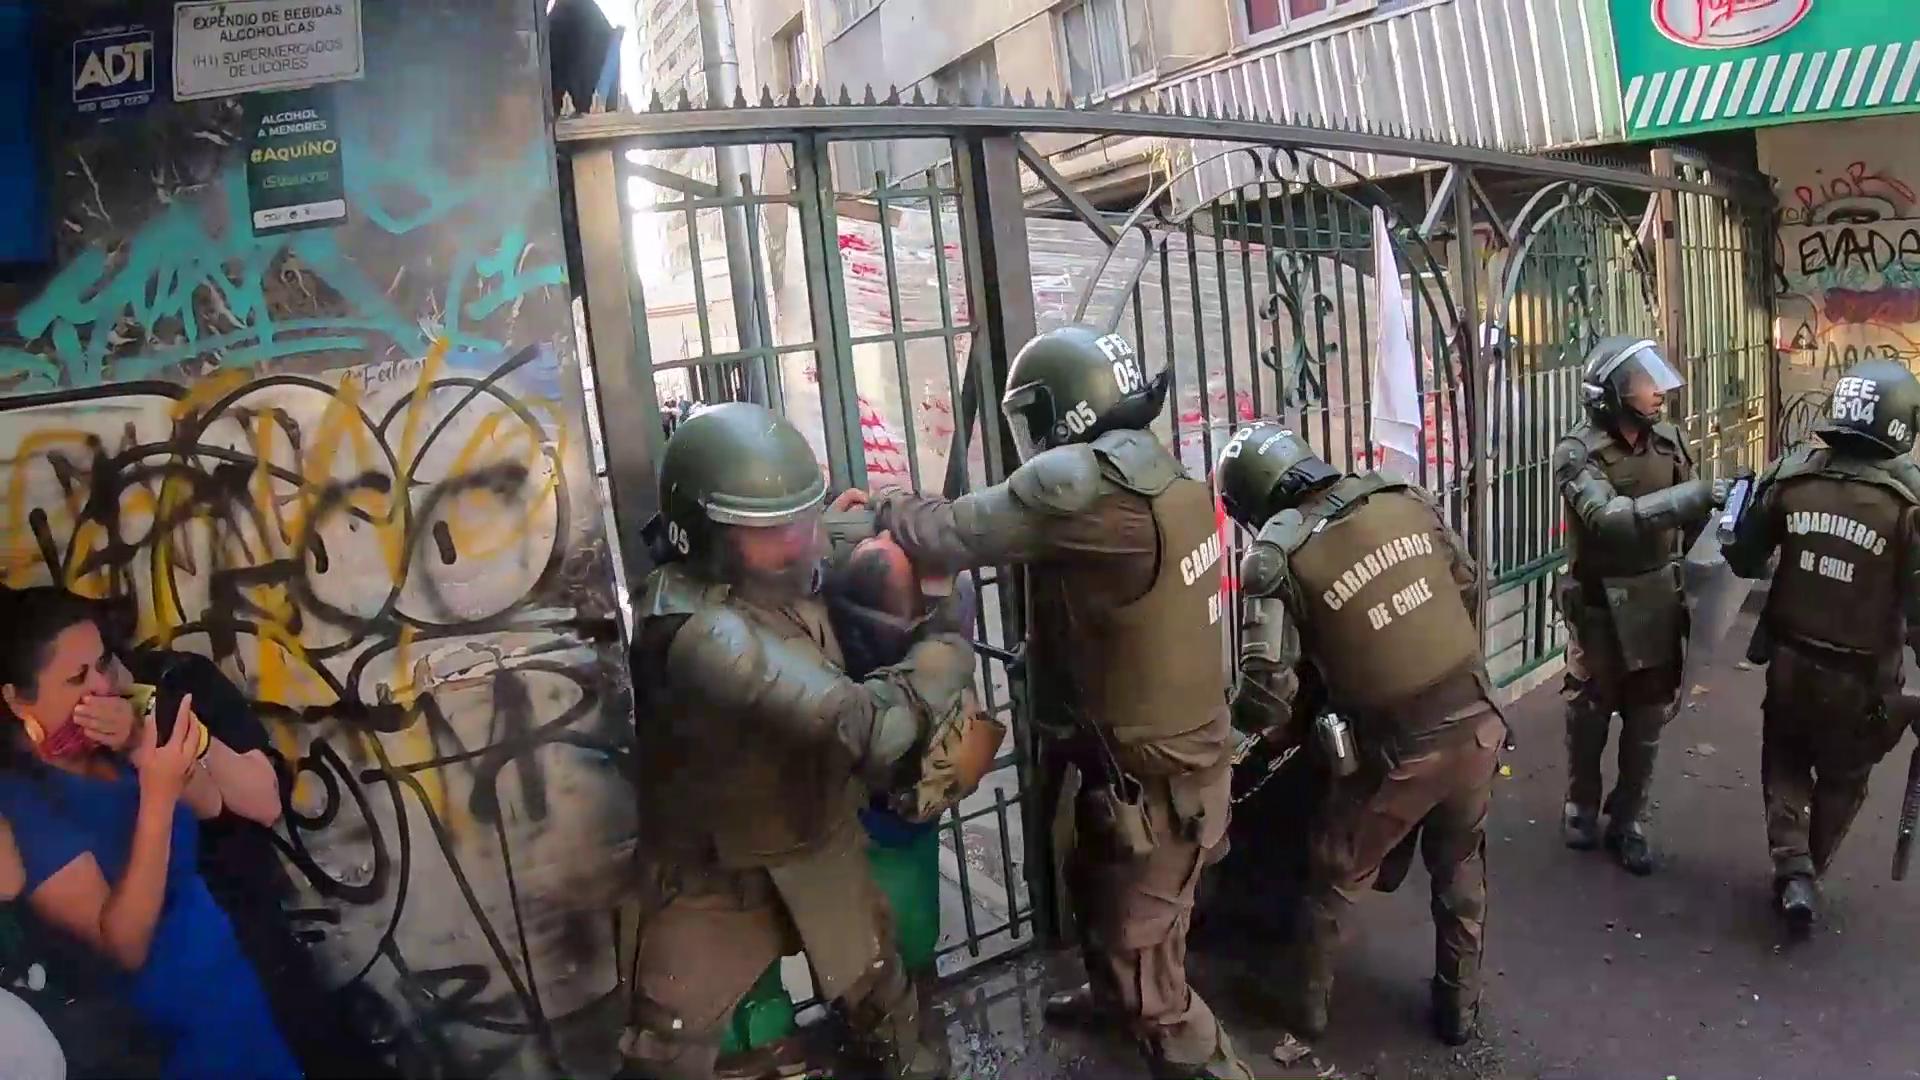 Preocupación internacional por aprobación de leyes represivas en Chile